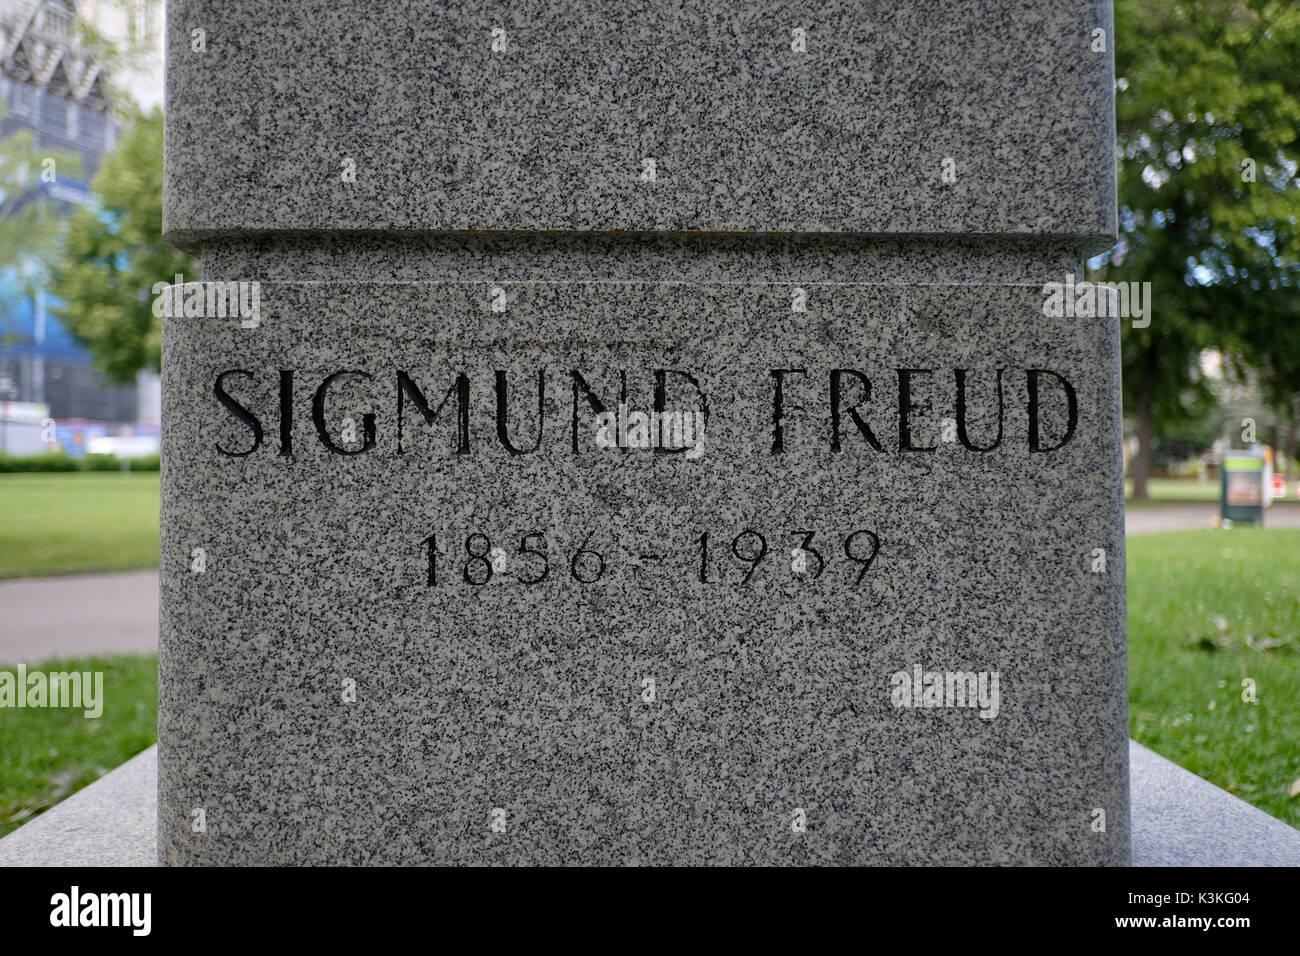 Europe, Austria, Vienna, capital, Sigmund Freud menproal, detail - Stock Image